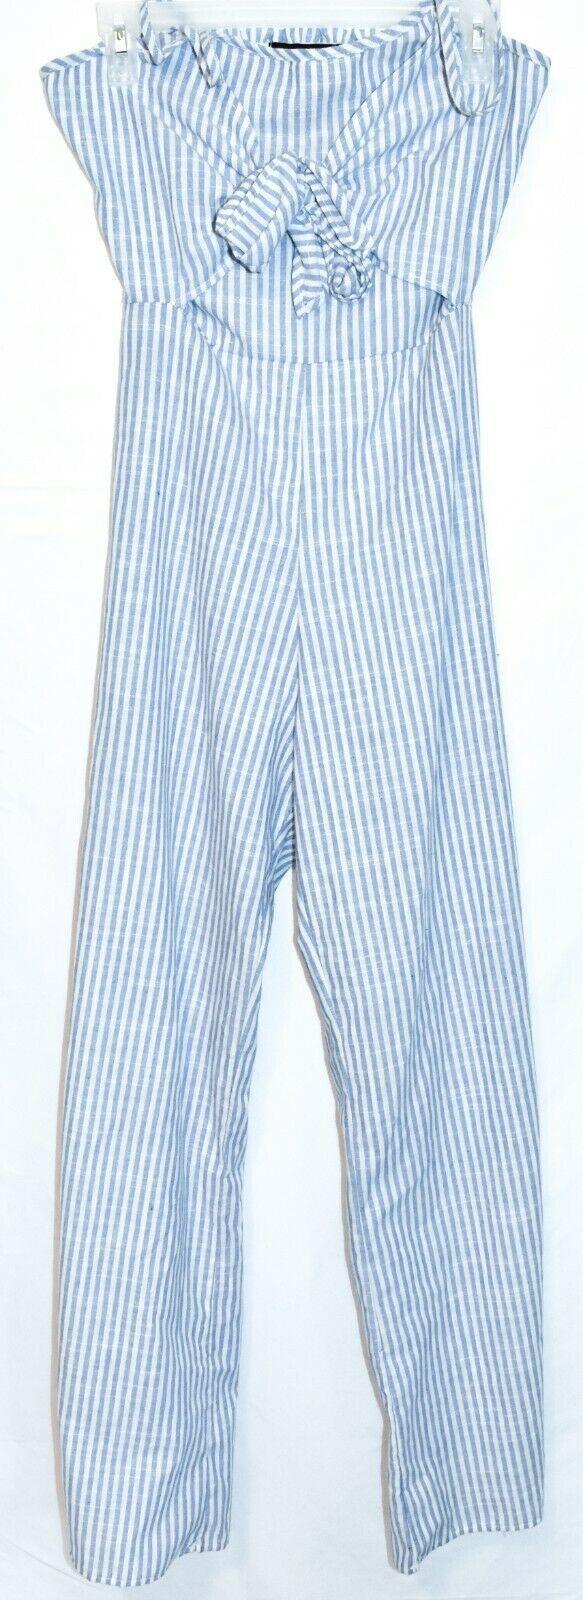 ONEBYEONE Women's Blue White Pinstripe Sleeveless Jumpsuit Playsuit Size S